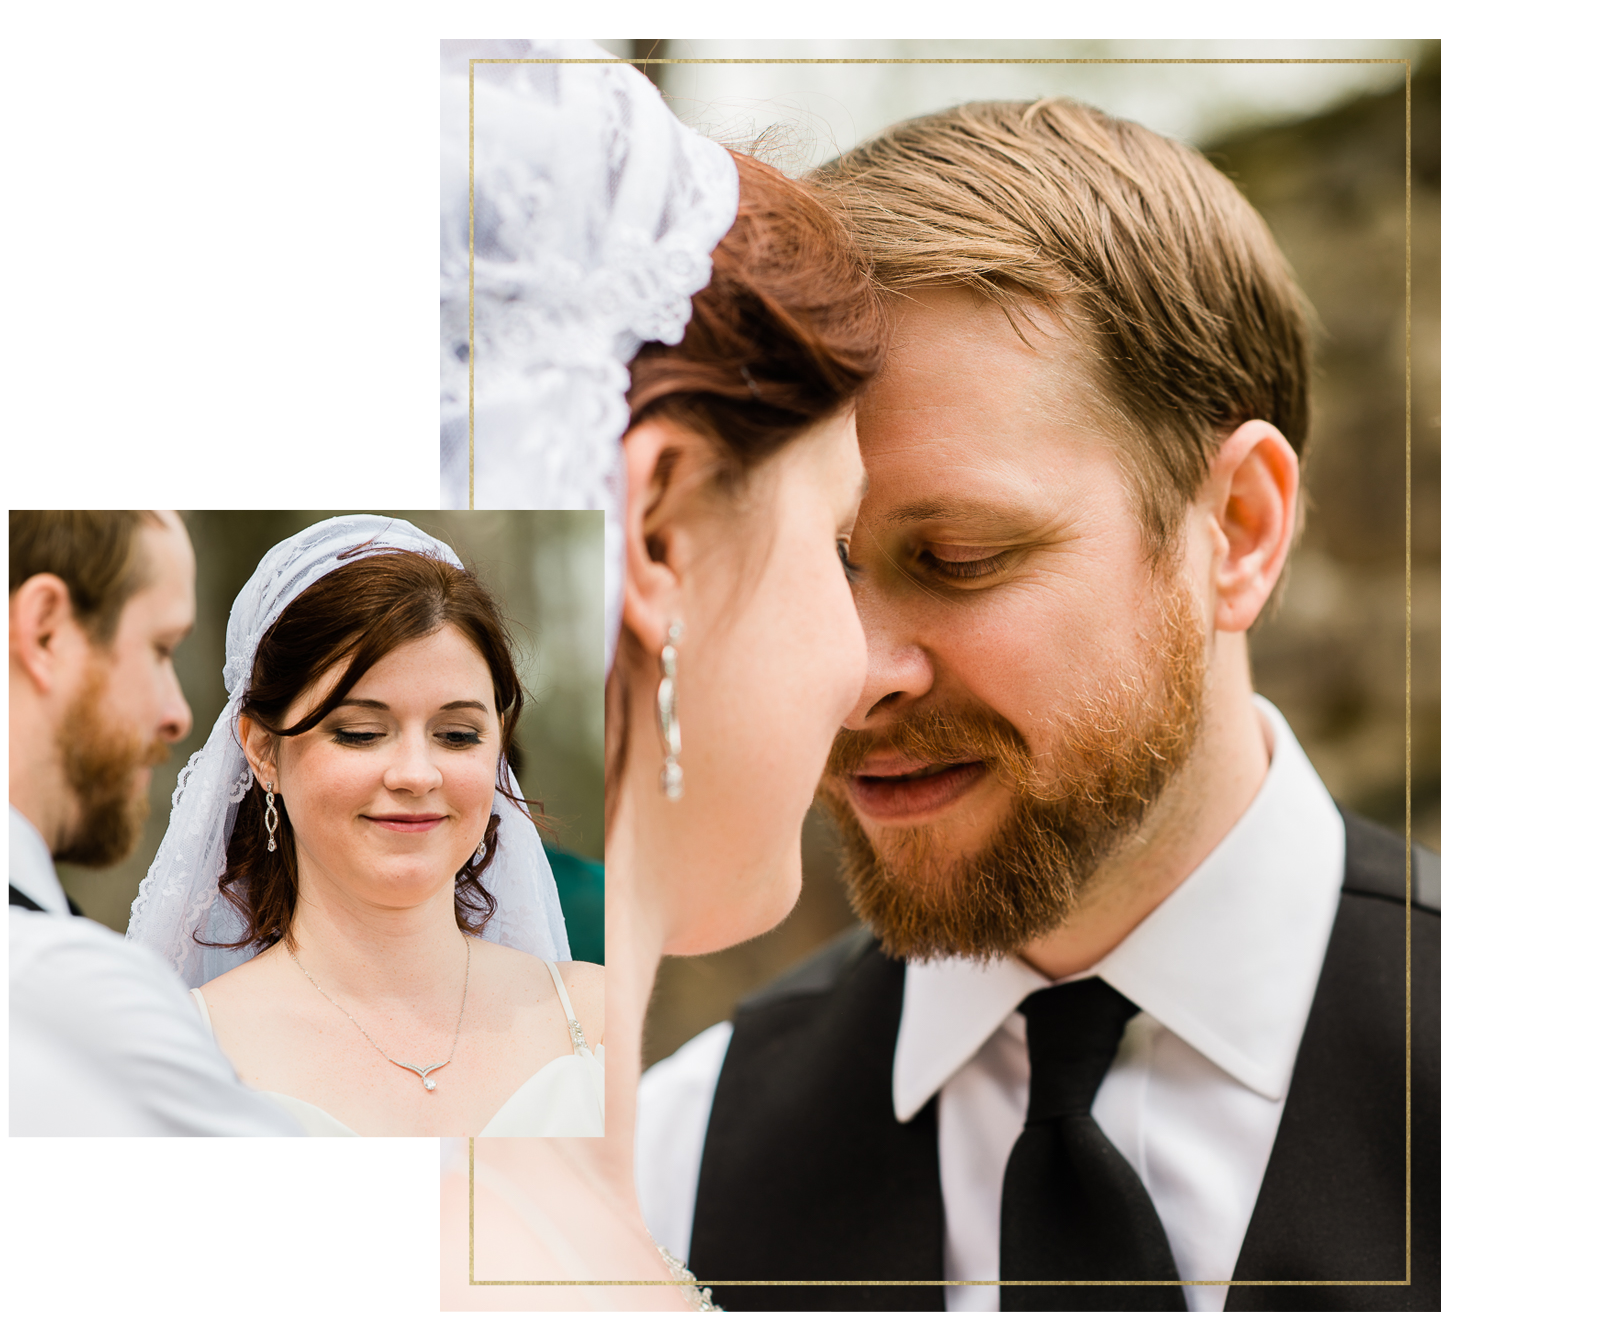 DANIELLE + JUSTIN - Landsford Canal Wedding | Rock Hill, SC